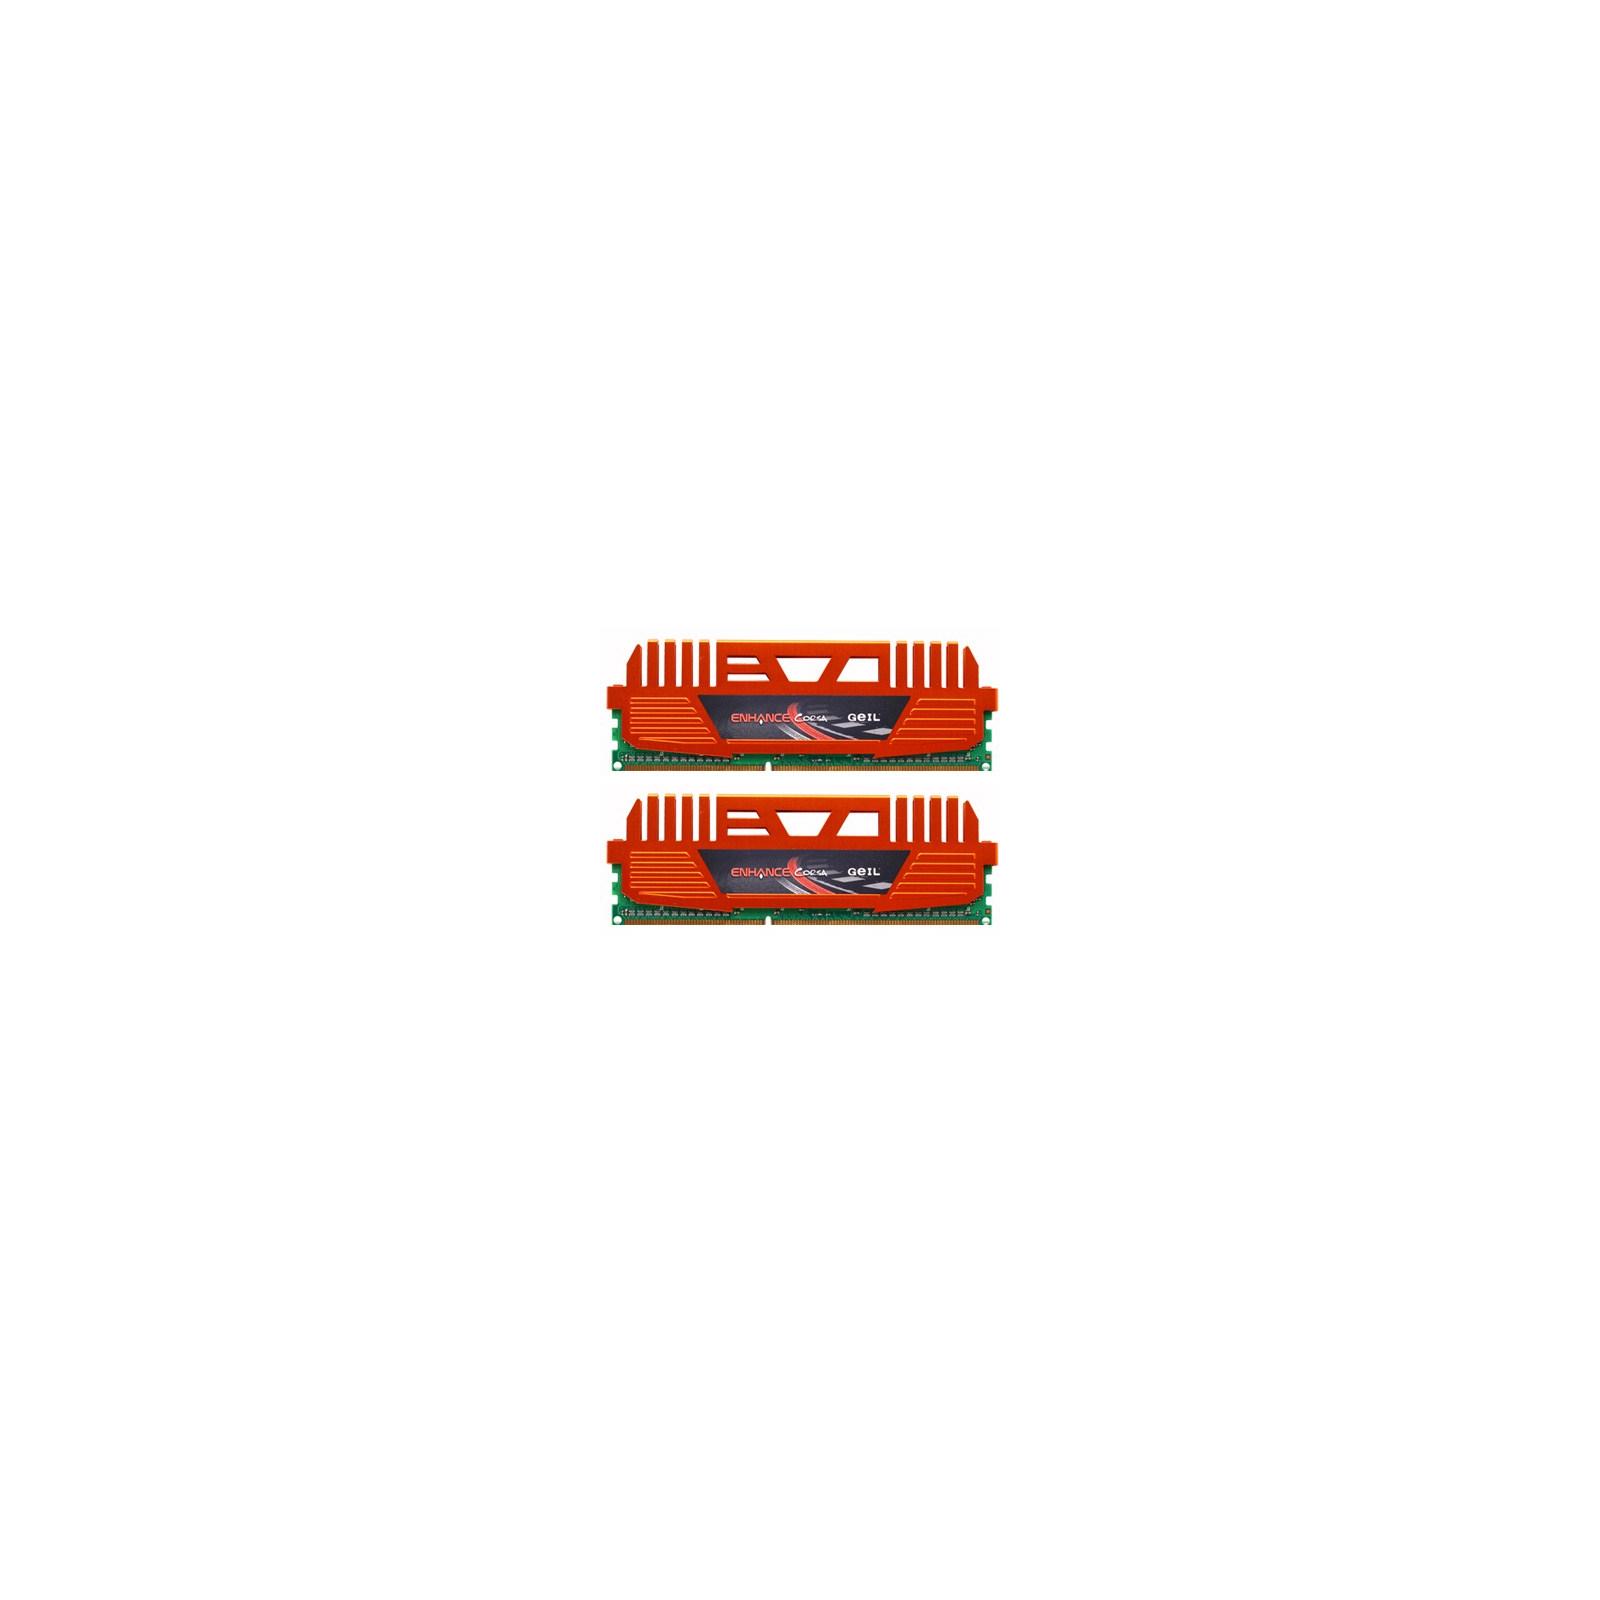 Модуль памяти для компьютера DDR3 4GB (2x2GB) 1600 MHz GEIL (GEC34GB1600C9DC)